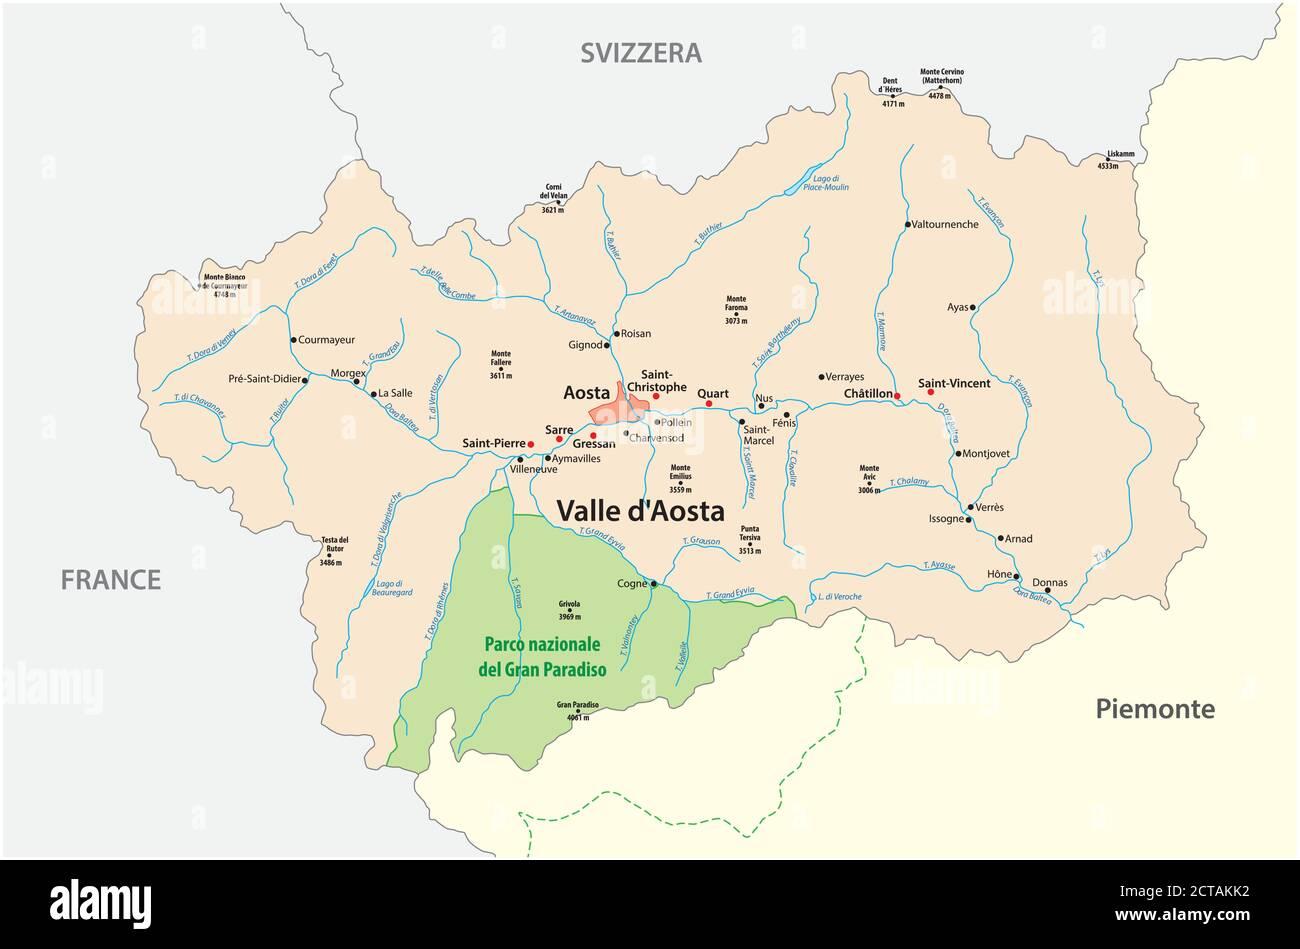 Cartina Muta Della Valle D Aosta.Italy Map Outline Vector Immagini E Fotos Stock Alamy